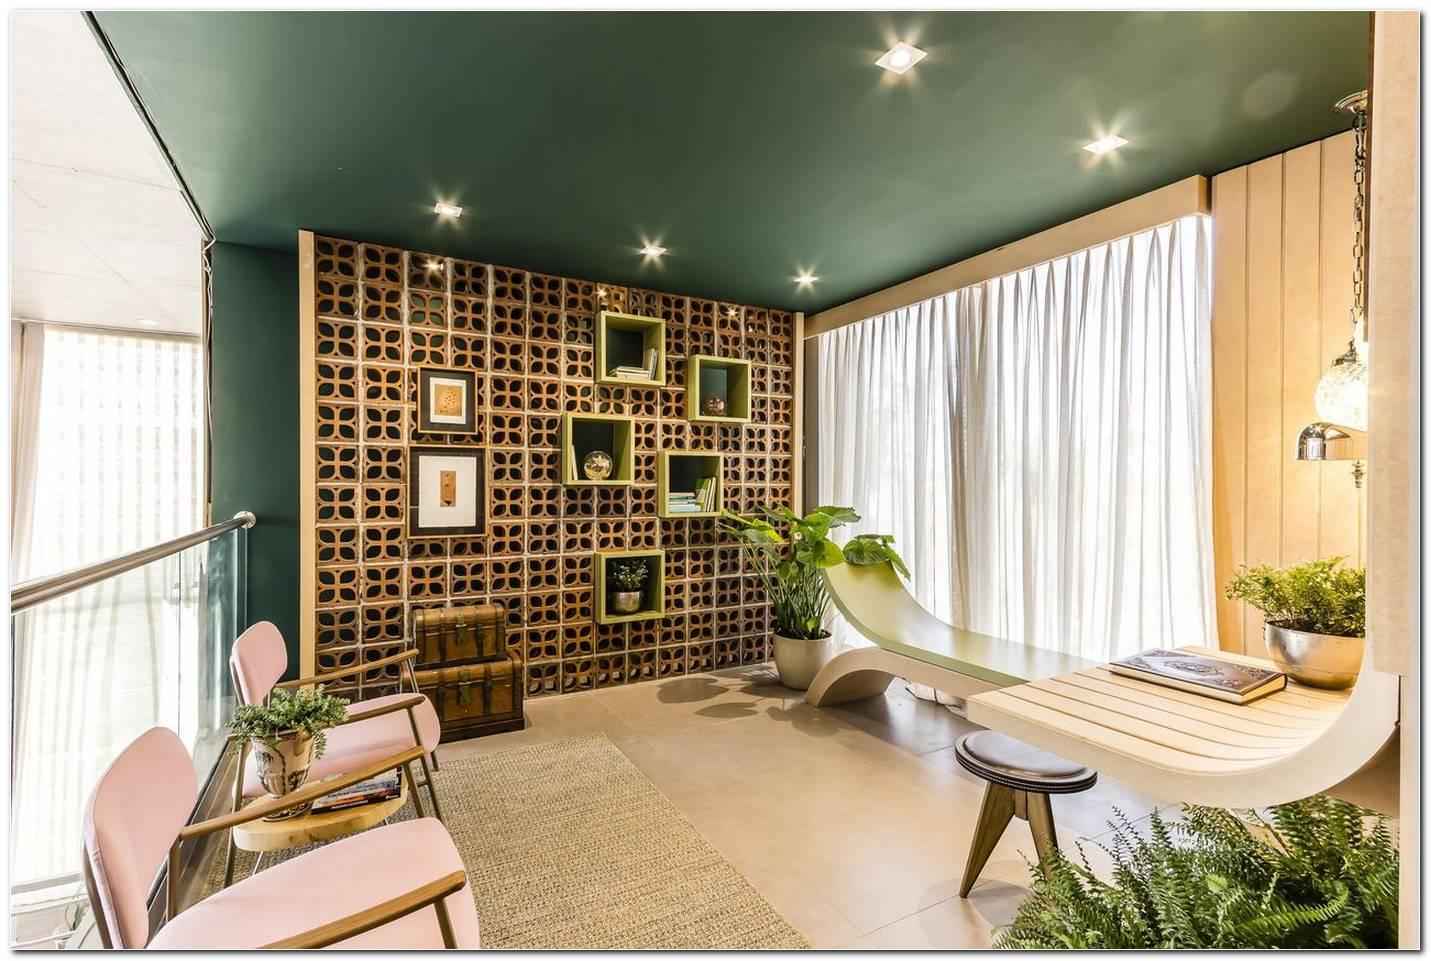 Sala De Estar Parede Verde Musgo